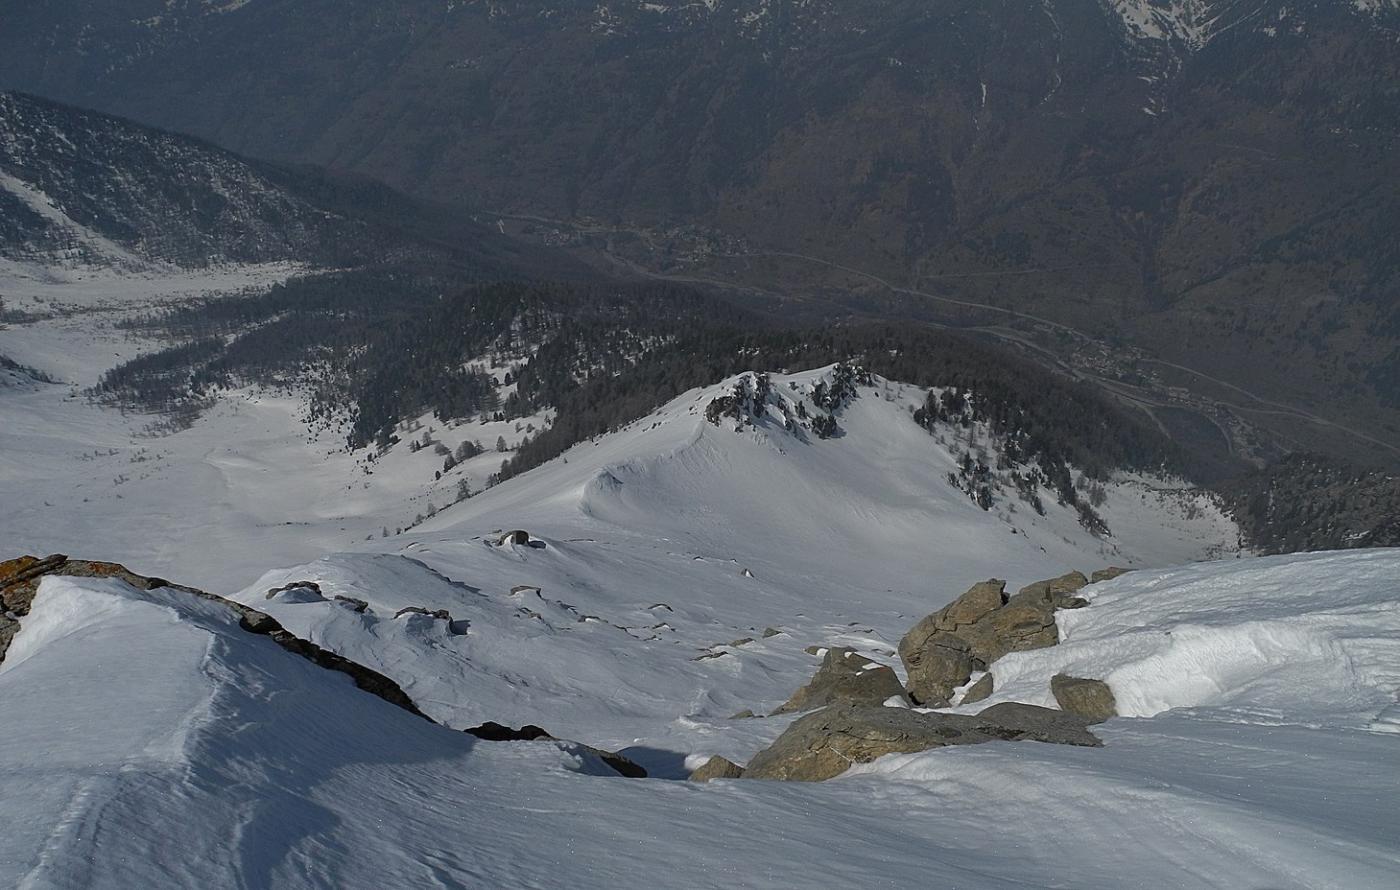 Ciabertas (Monte) da Fraisse per il versante Ovest 2015-04-10